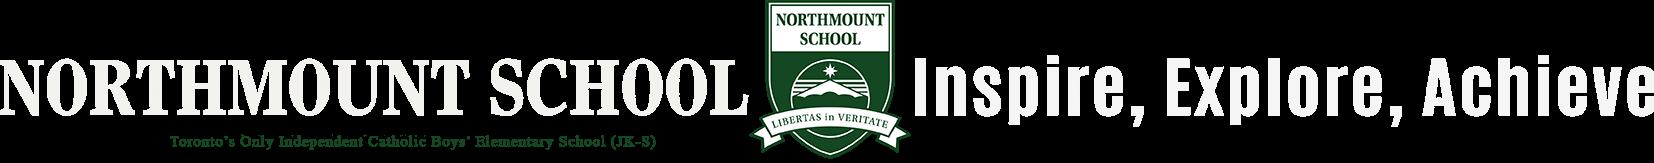 Northmount